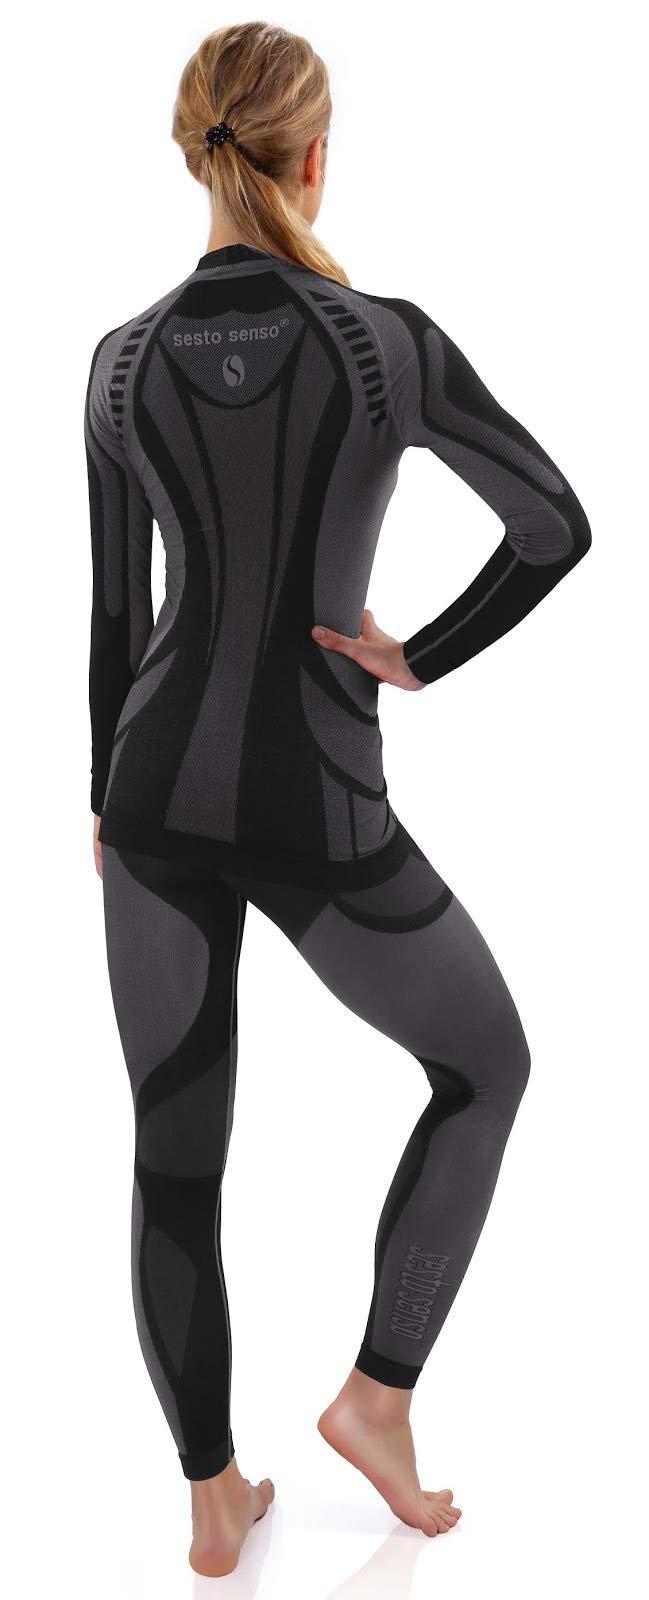 Sesto Senso® Women Functional Underwear Set Long Johns Leggings and Long Sleeve Vest T-Shirt Base Layer 3